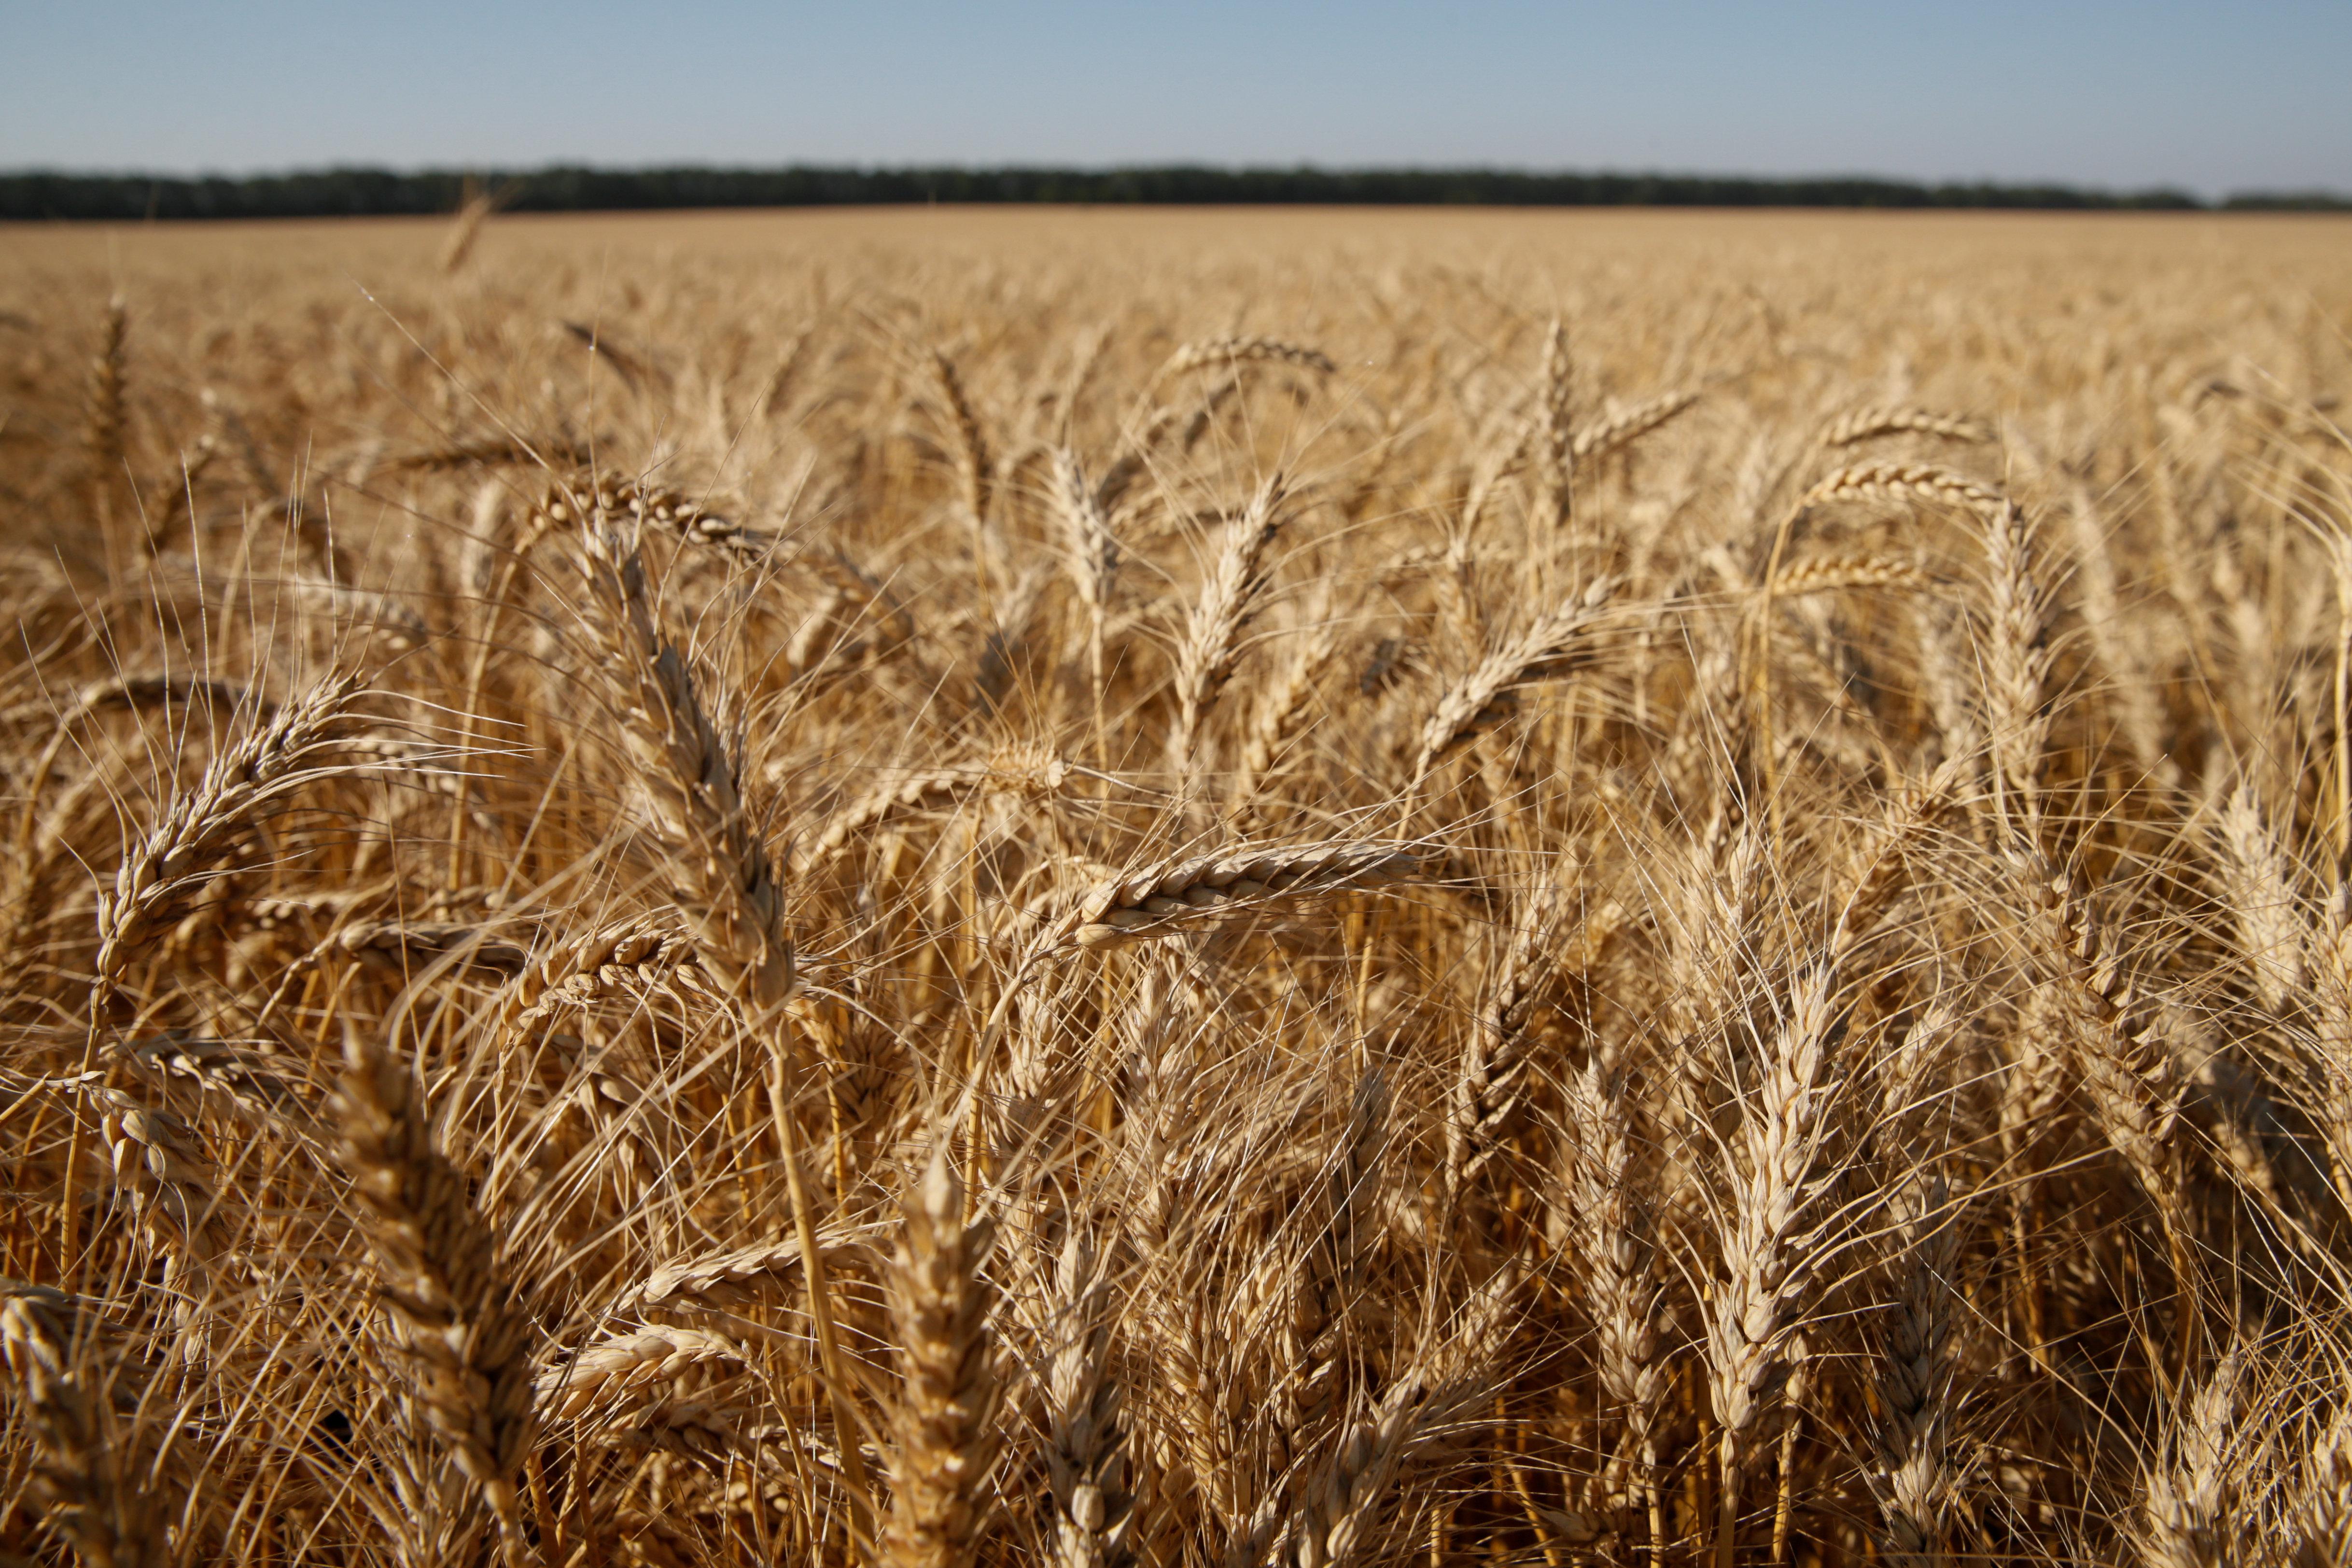 A wheat field is pictured near the village of Zhovtneve, Ukraine, July 14, 2016.  REUTERS/Valentyn Ogirenko